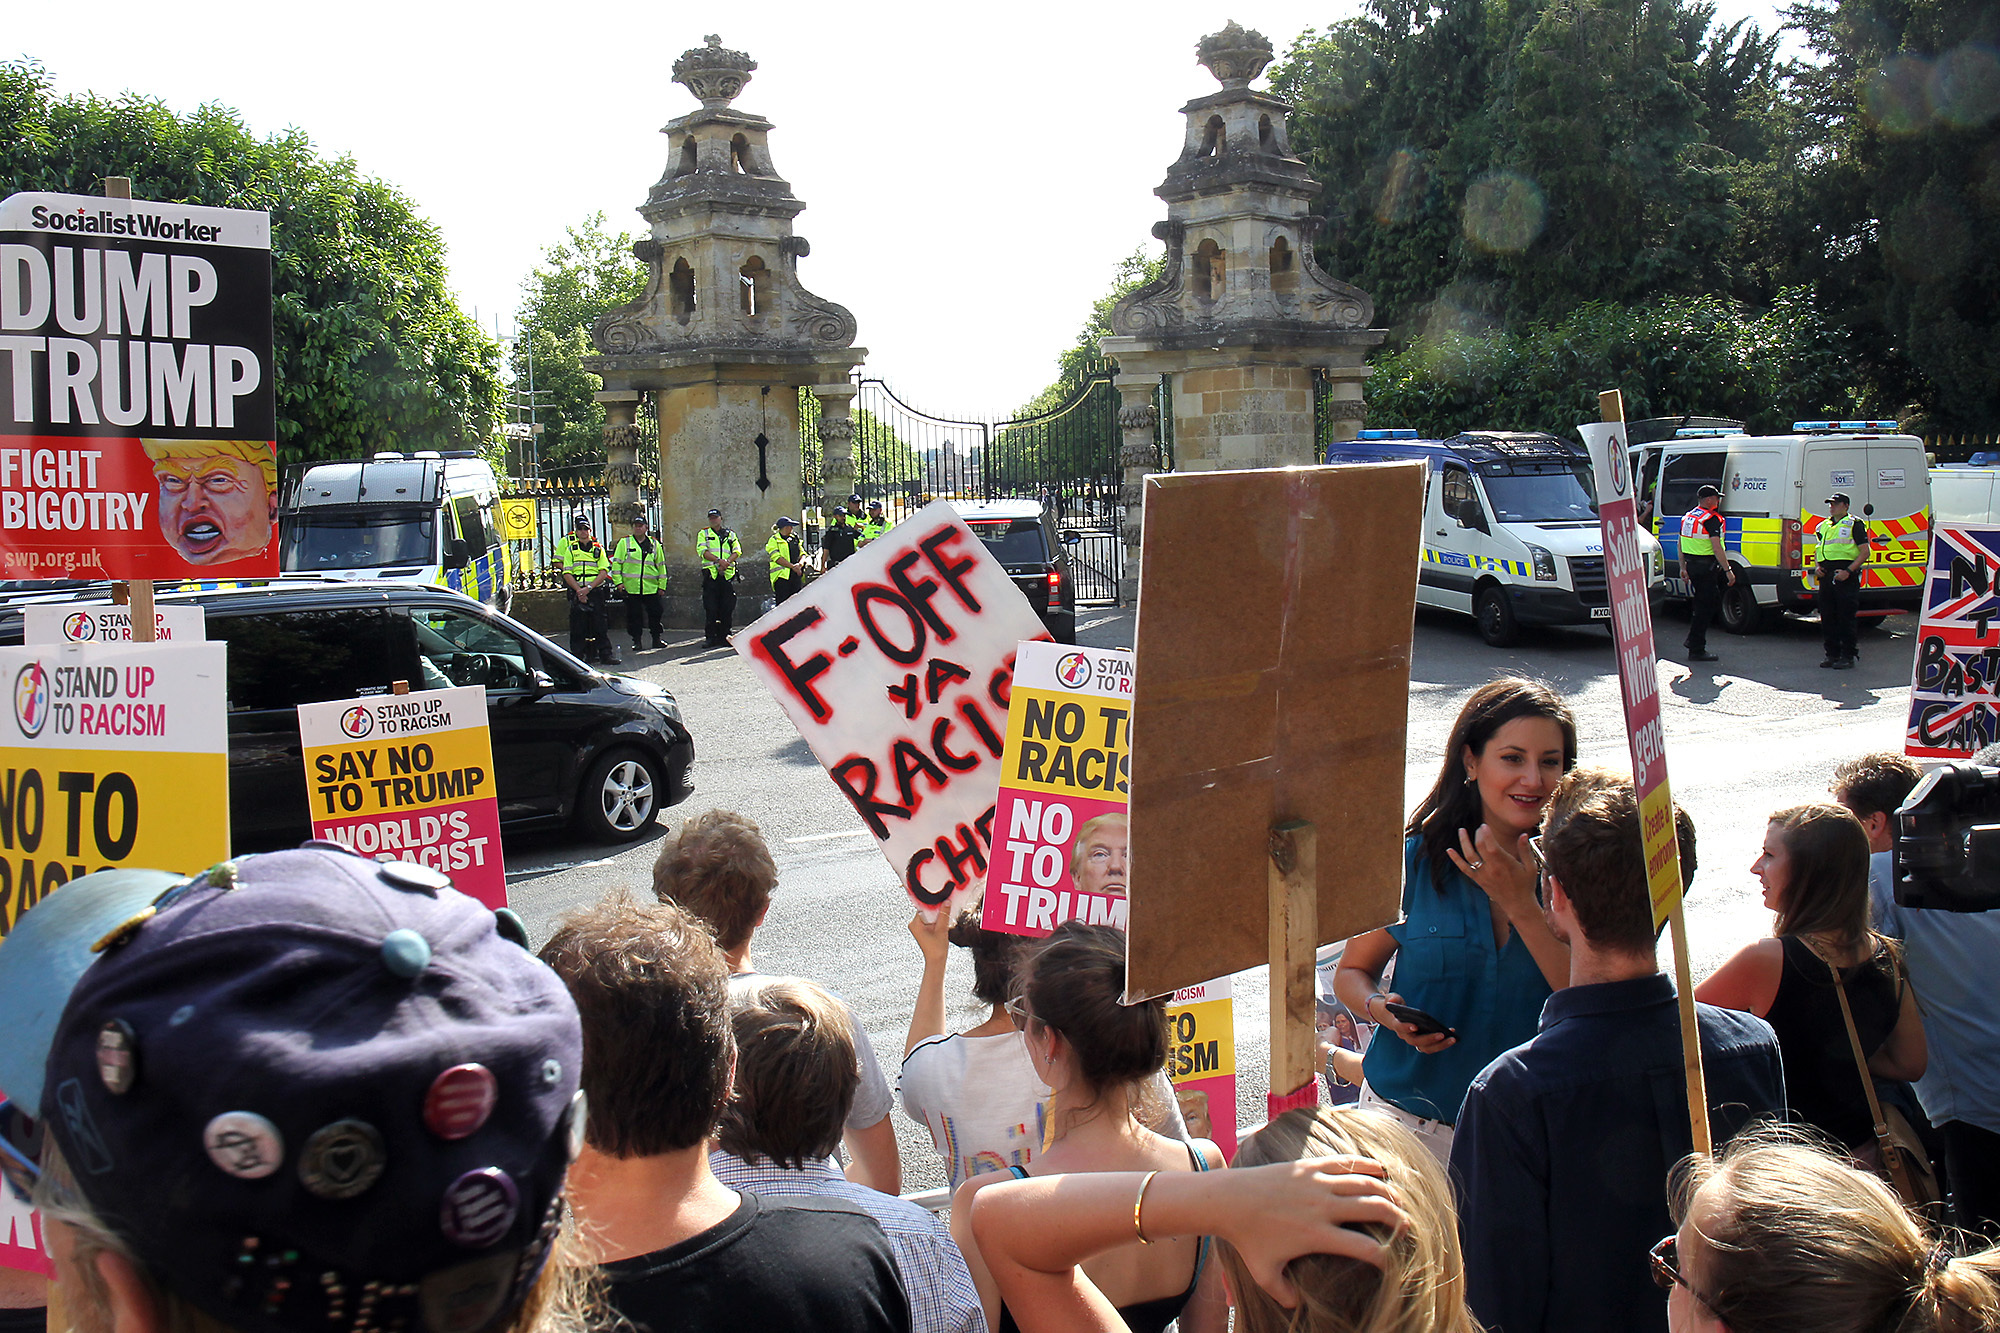 Oxford campaigners to plan anti-Trump protest